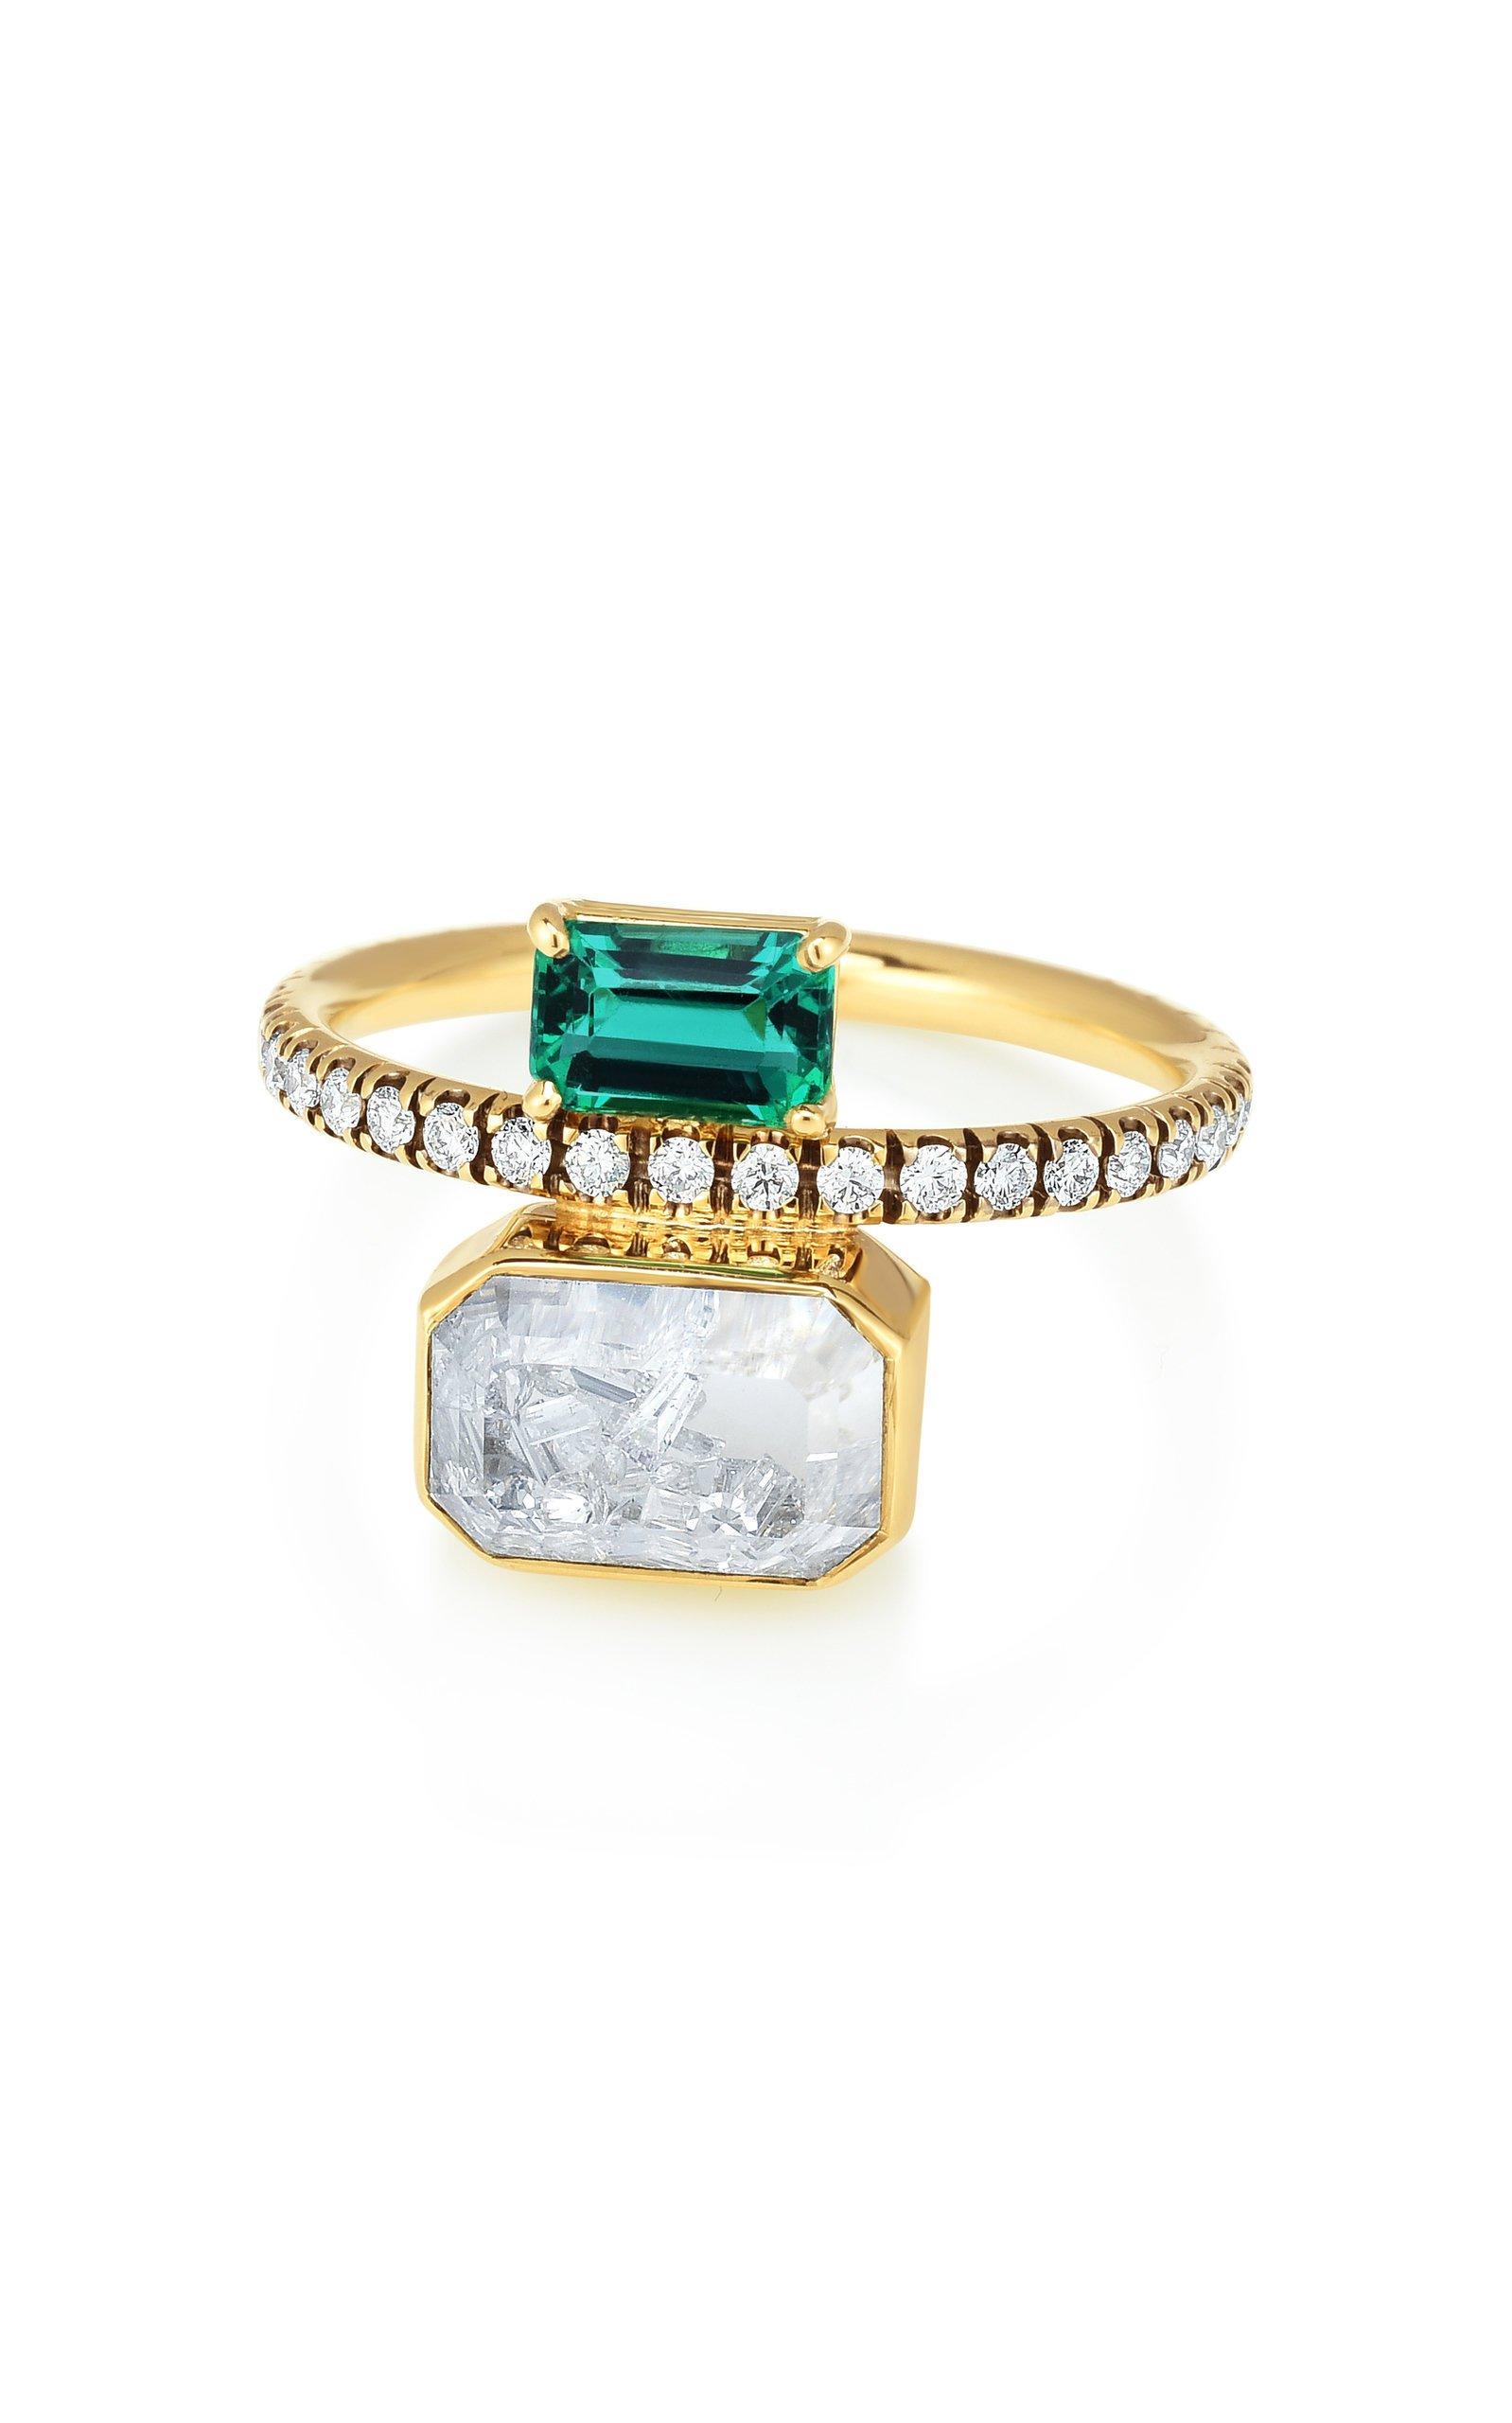 Moritz Glik Emerald And Diamond Kaleidoscope Shaker Ring